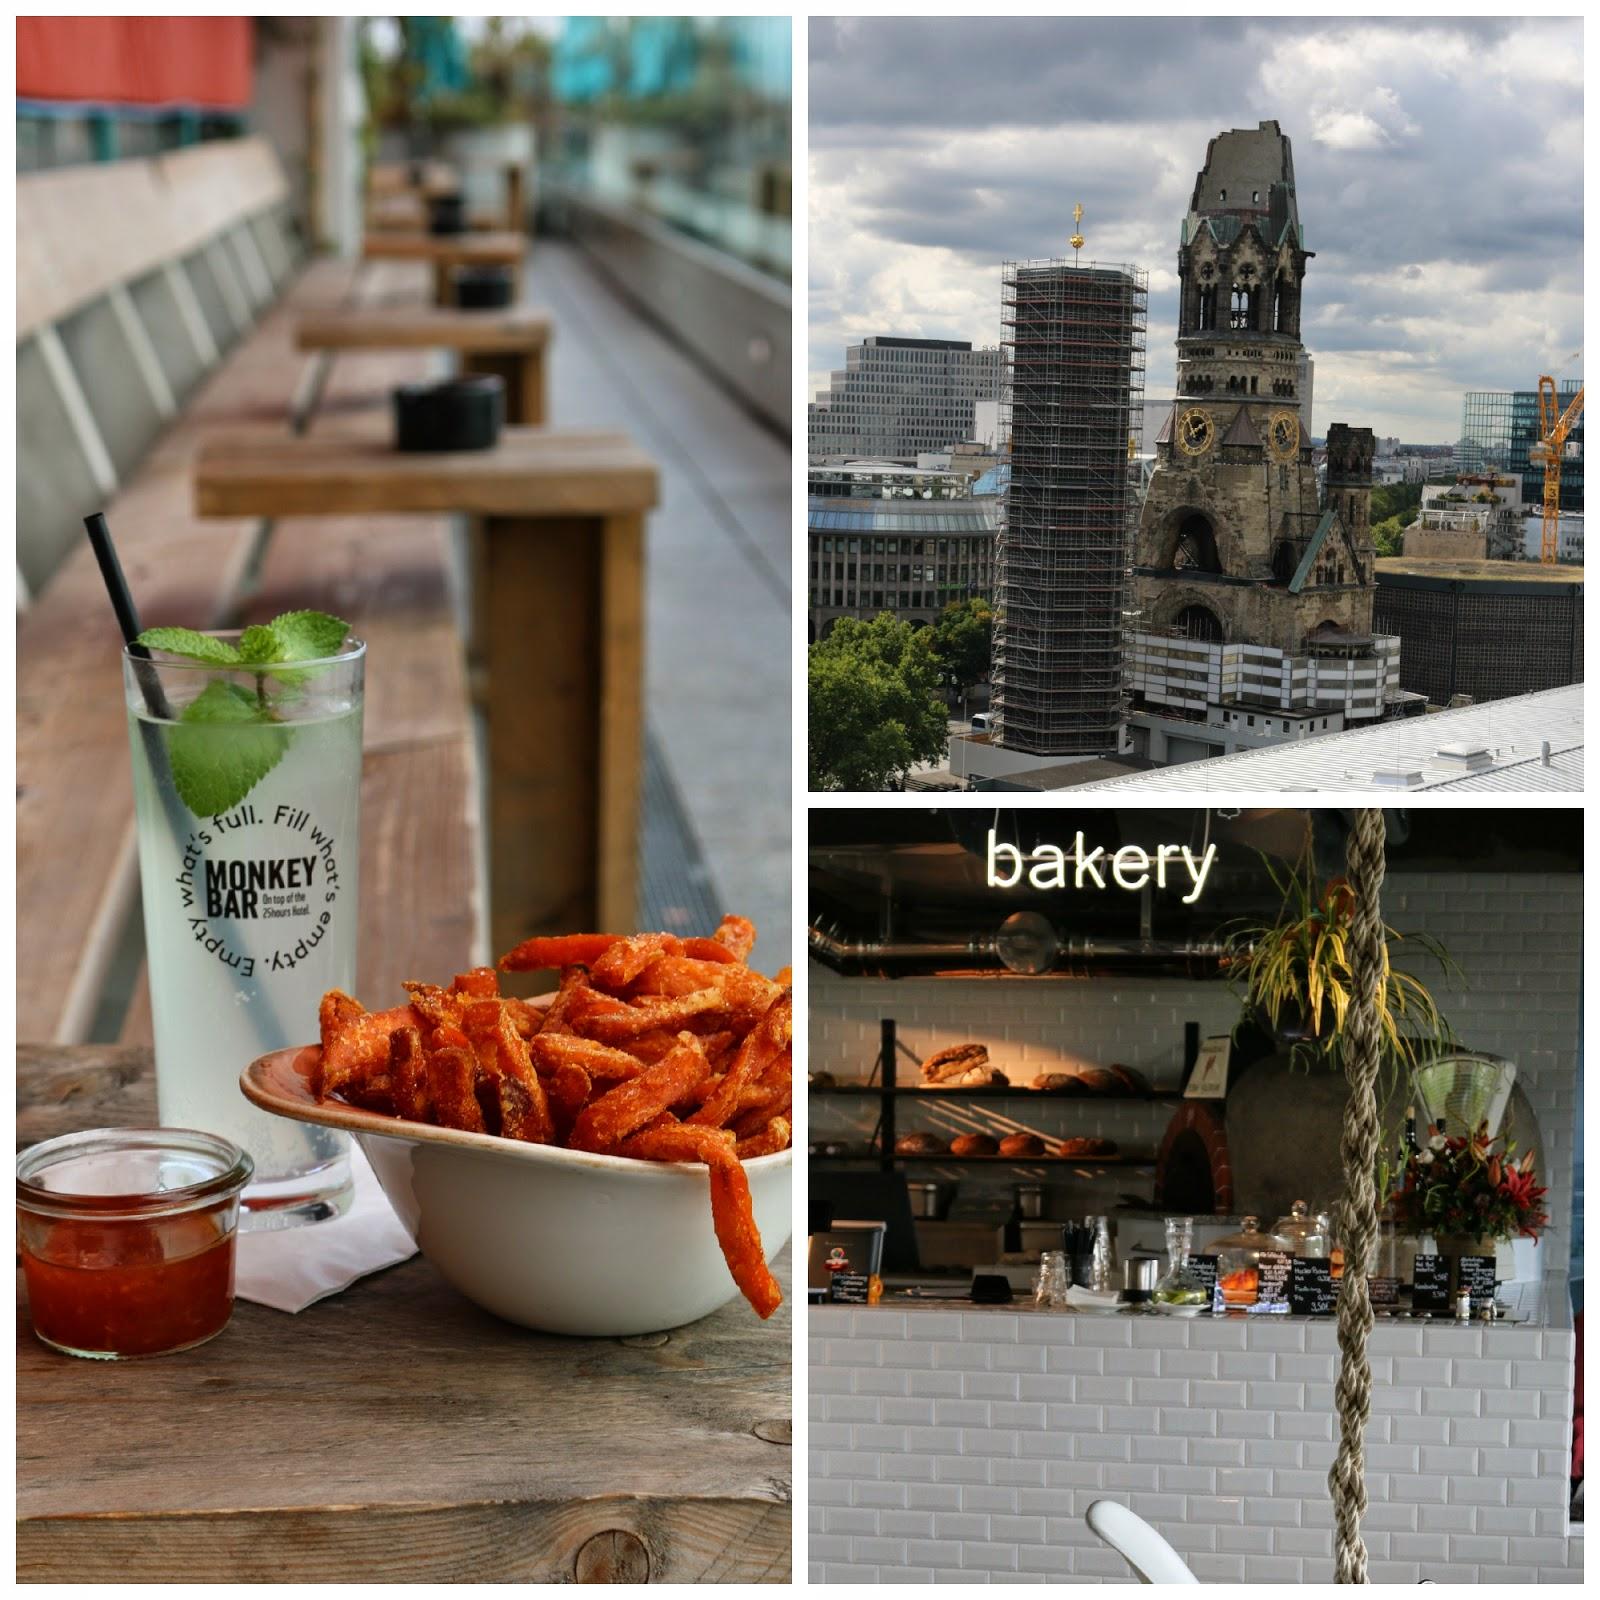 Berlin, Reisetipps, Städtereise, Tipps, Restaurants, Cafés, Shopping, Shops, Tourismus, Potsdam, 25hours hotel